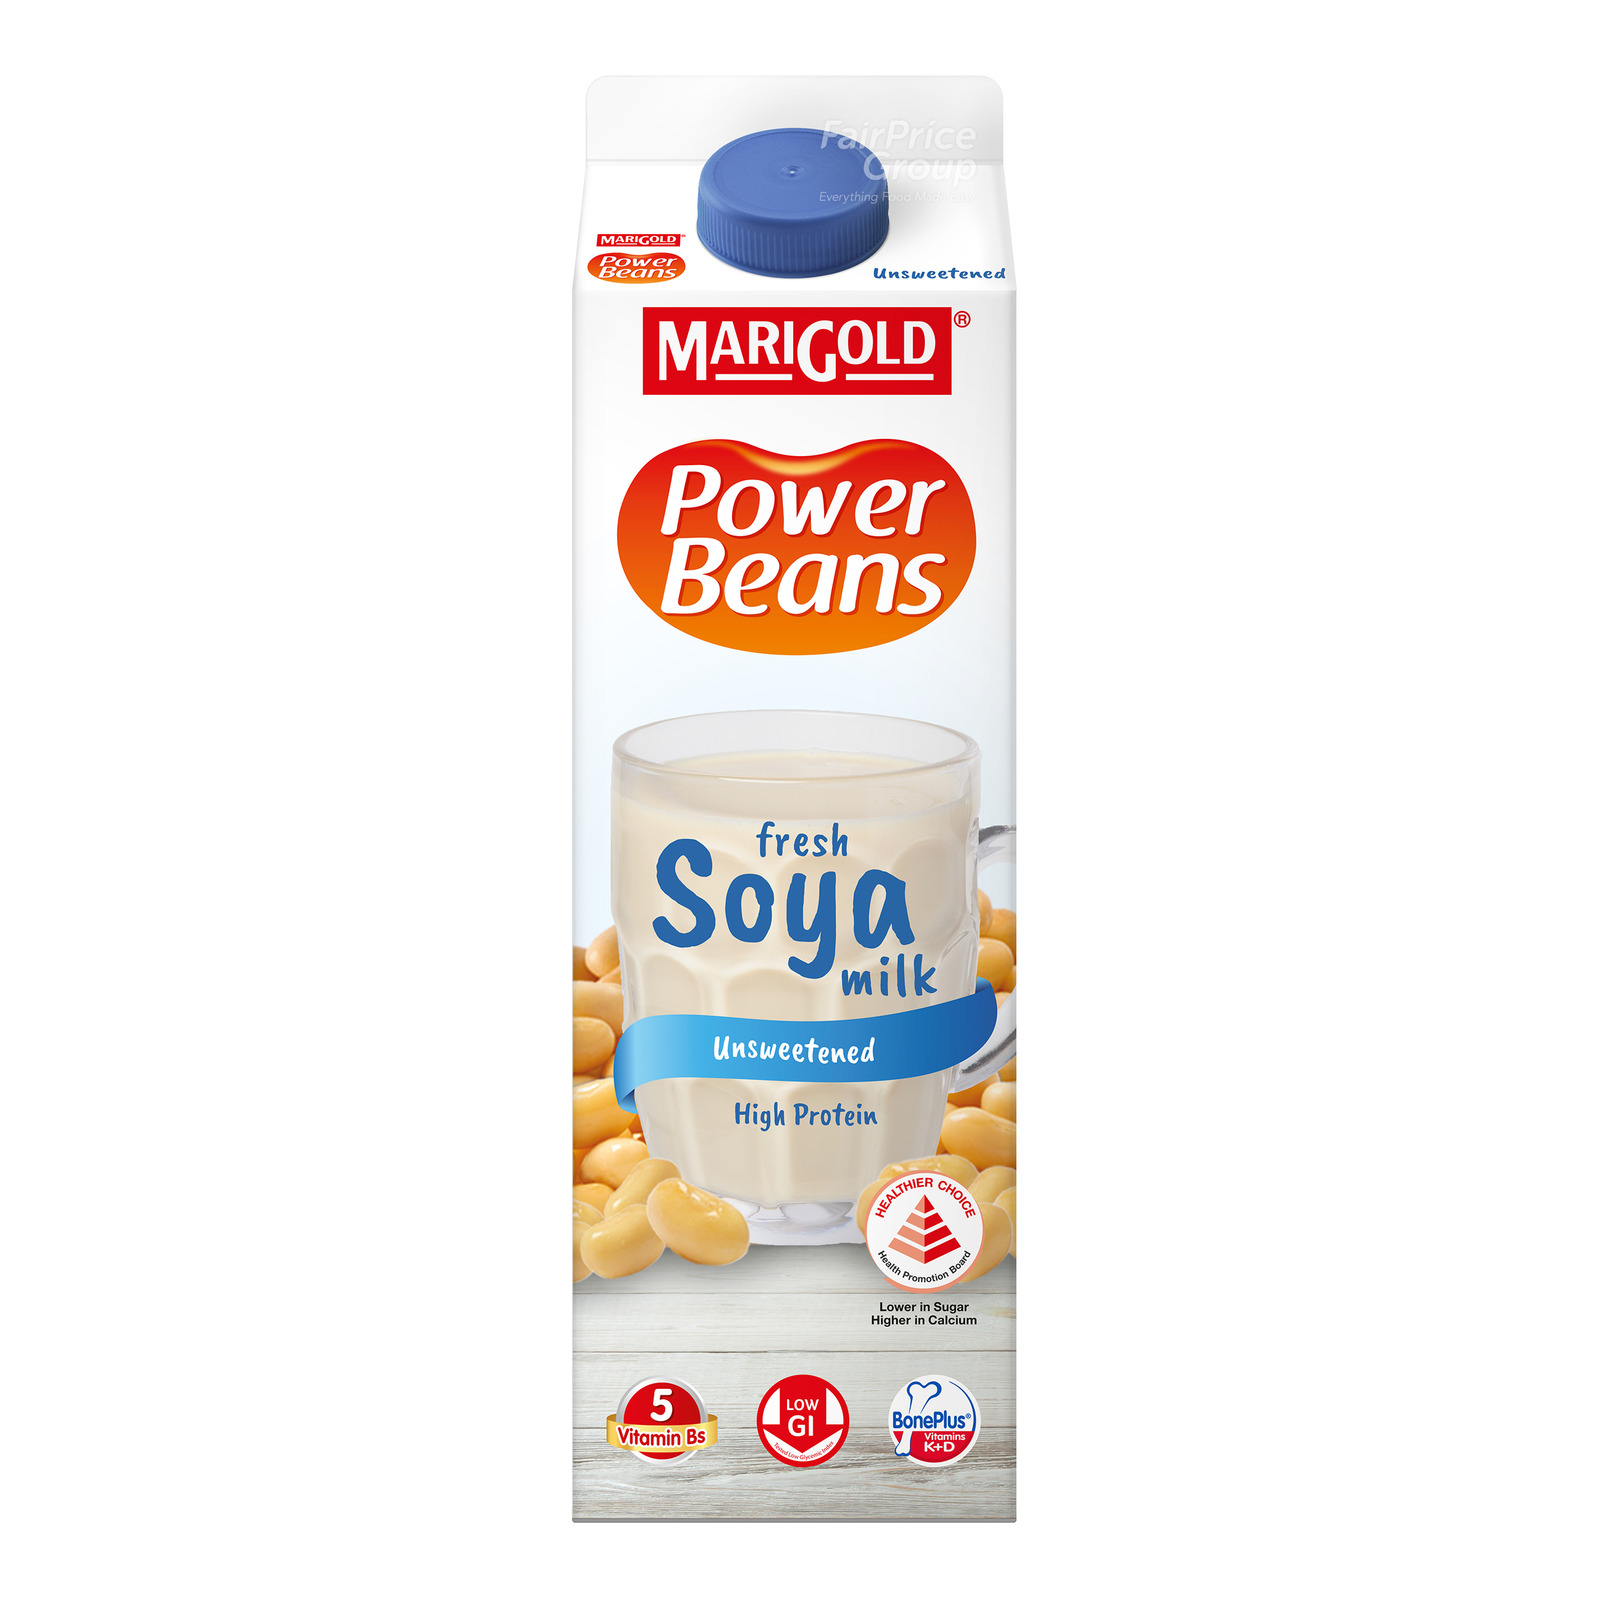 Marigold Power Beans Fresh Soya Milk - Unsweetened